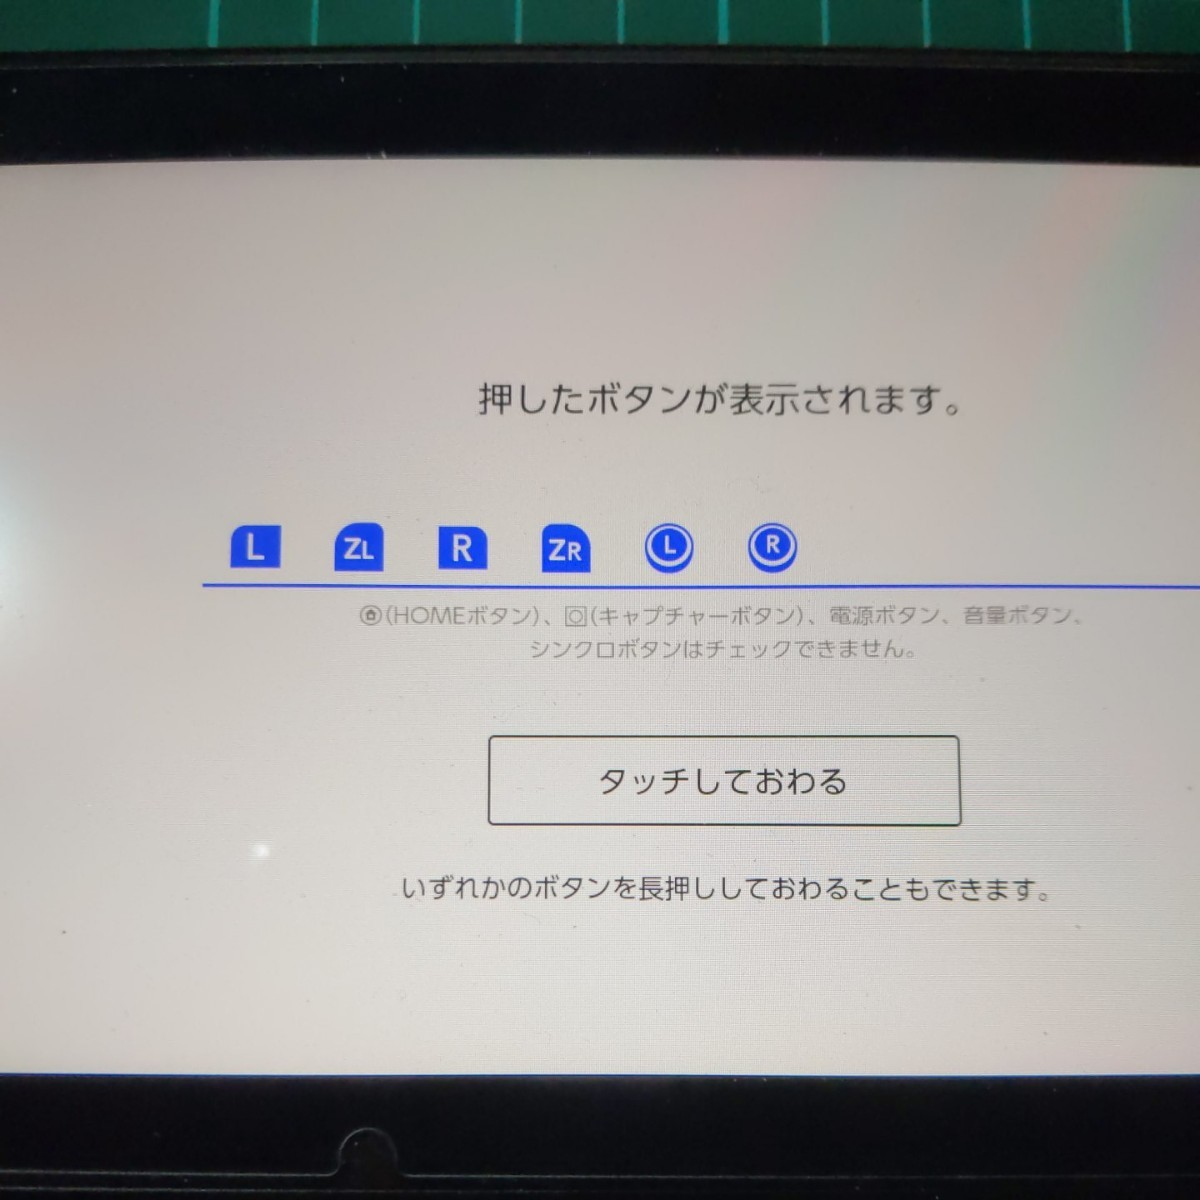 Nintendo Switchプロコン クリーニング・メンテナンス済